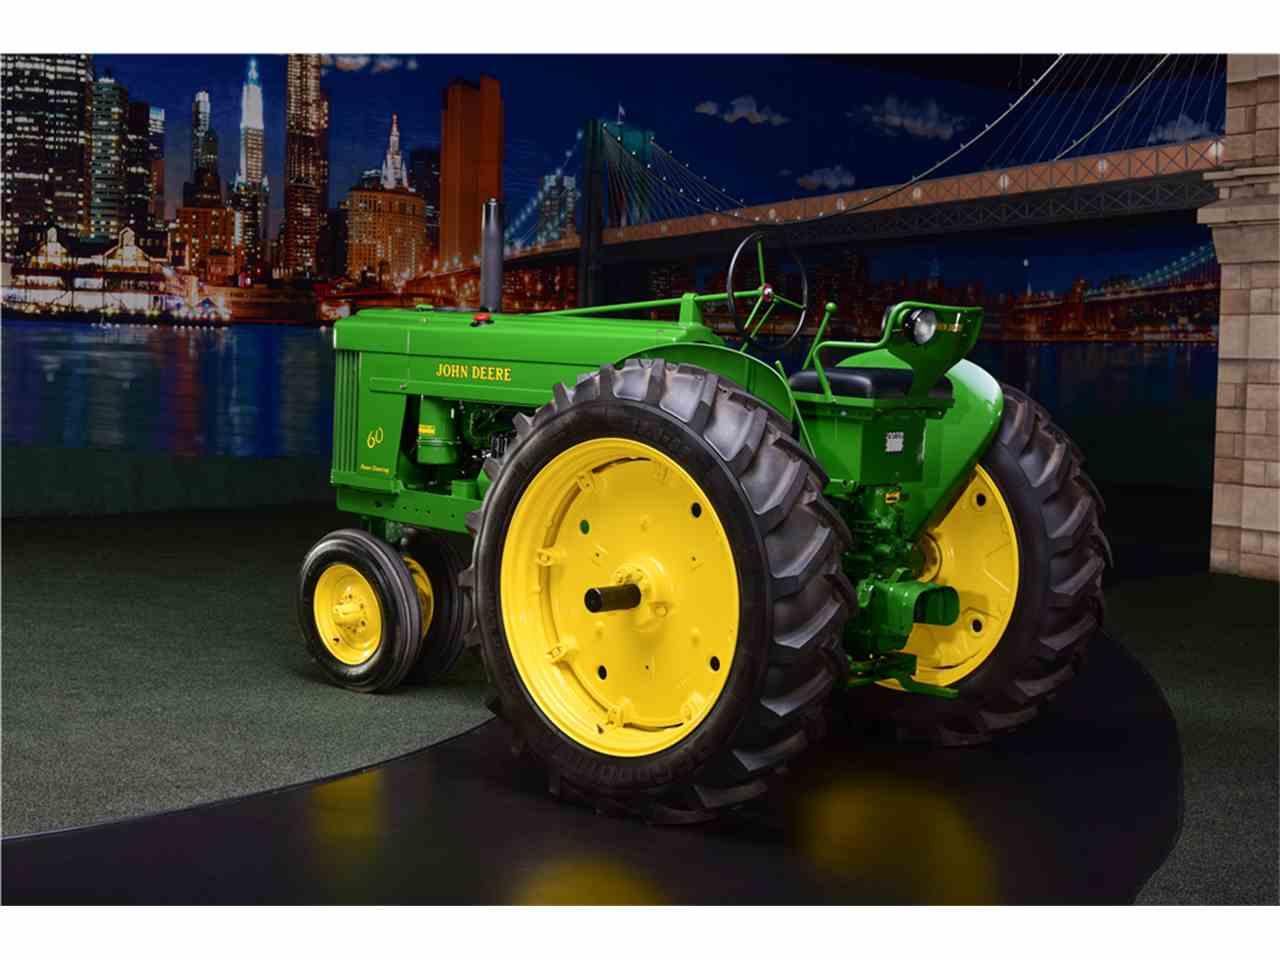 1954 John Deere Tractor for Sale ClassicCars com CC